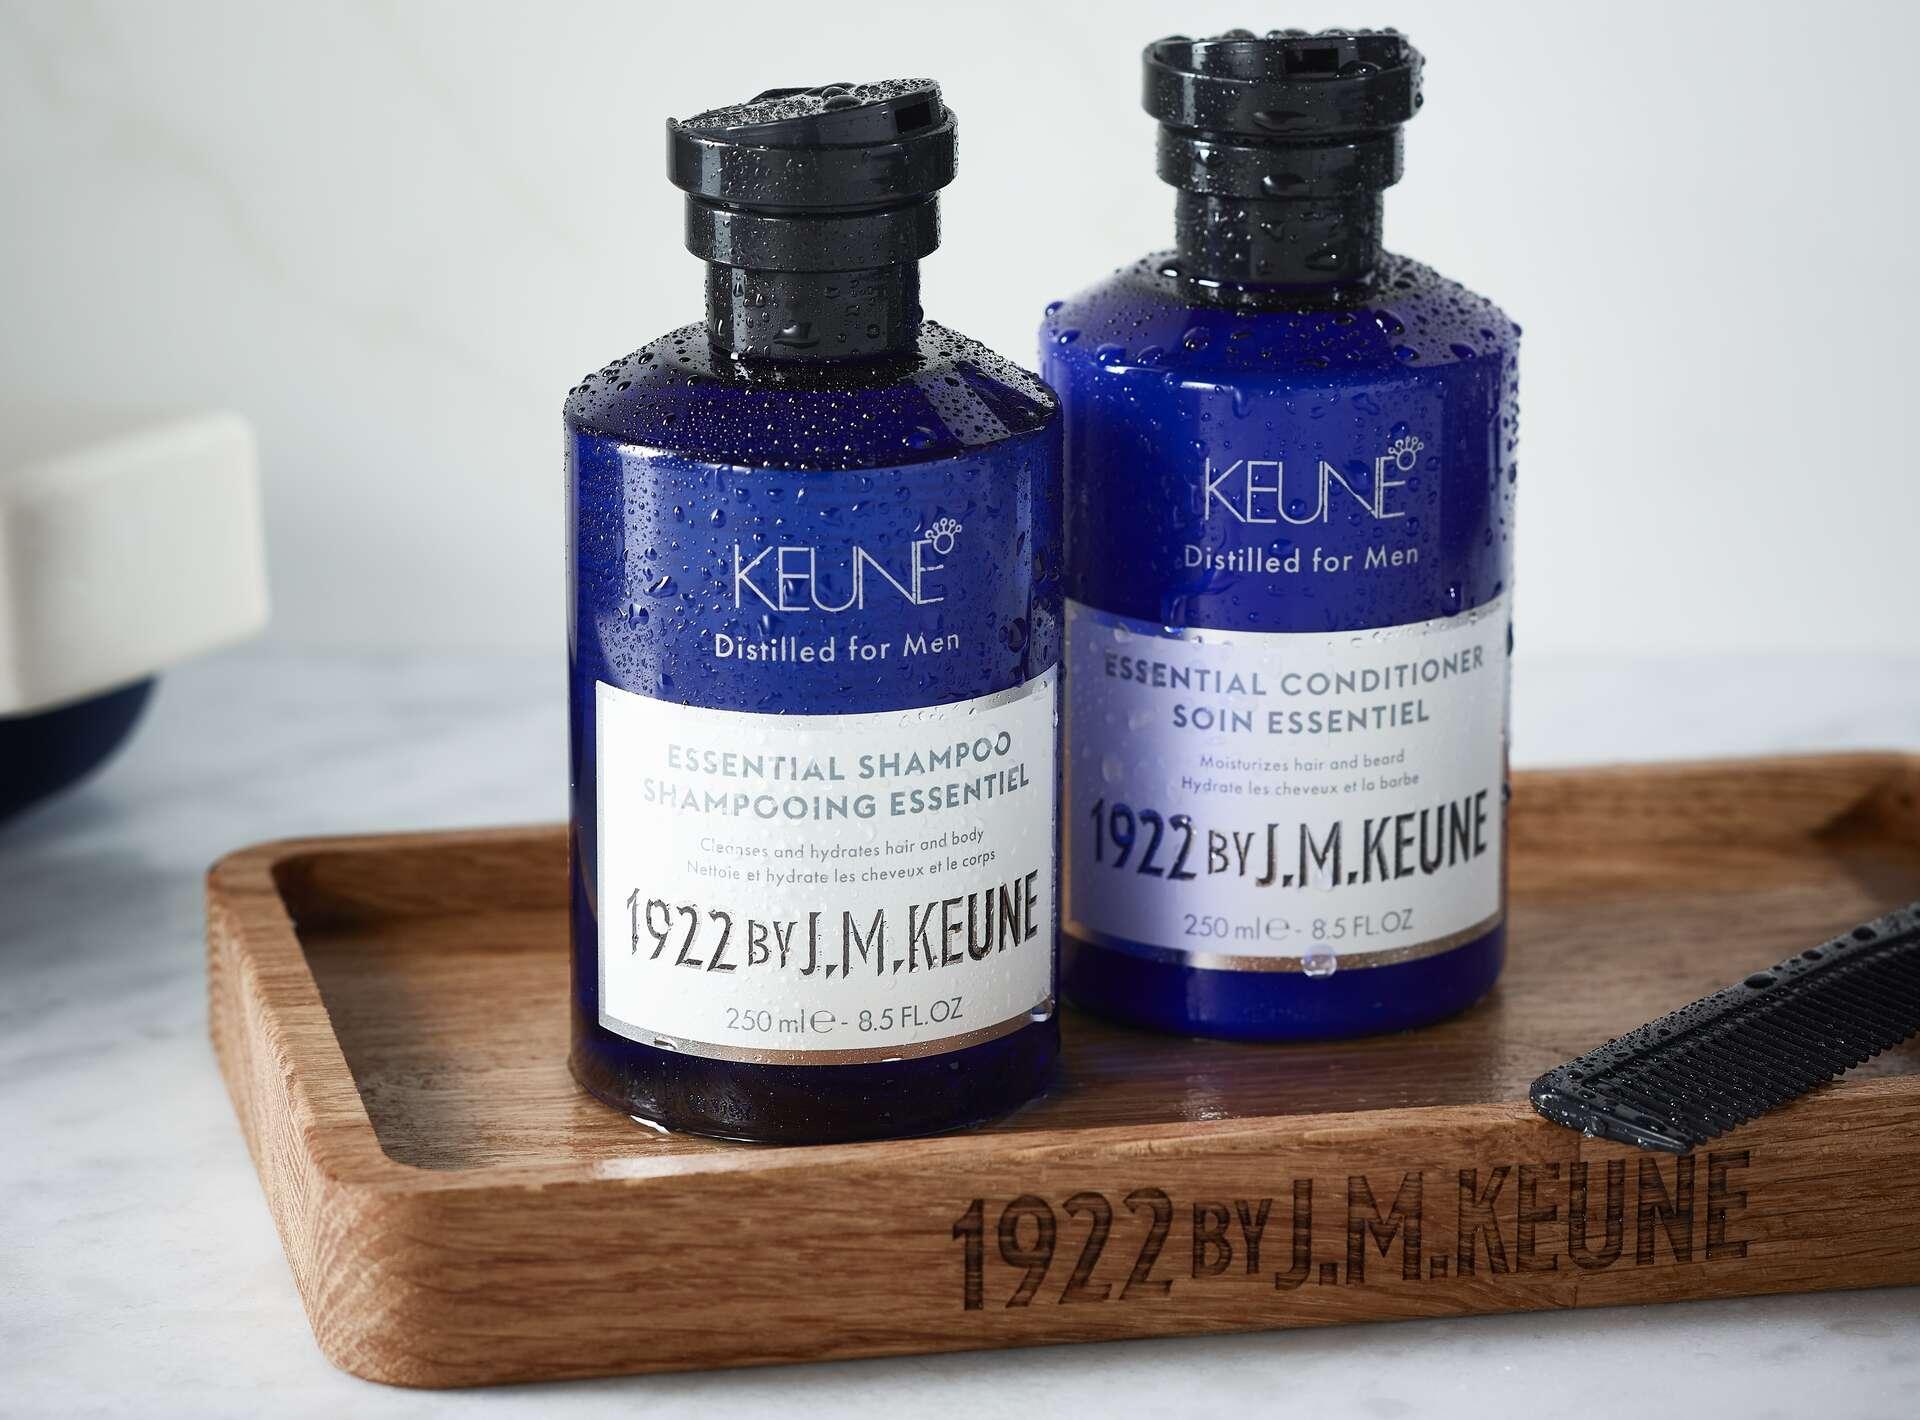 page-hero-1920×1420-medium-keune-1922-essential-shampoo-conditioner-group-lifestyle-api1